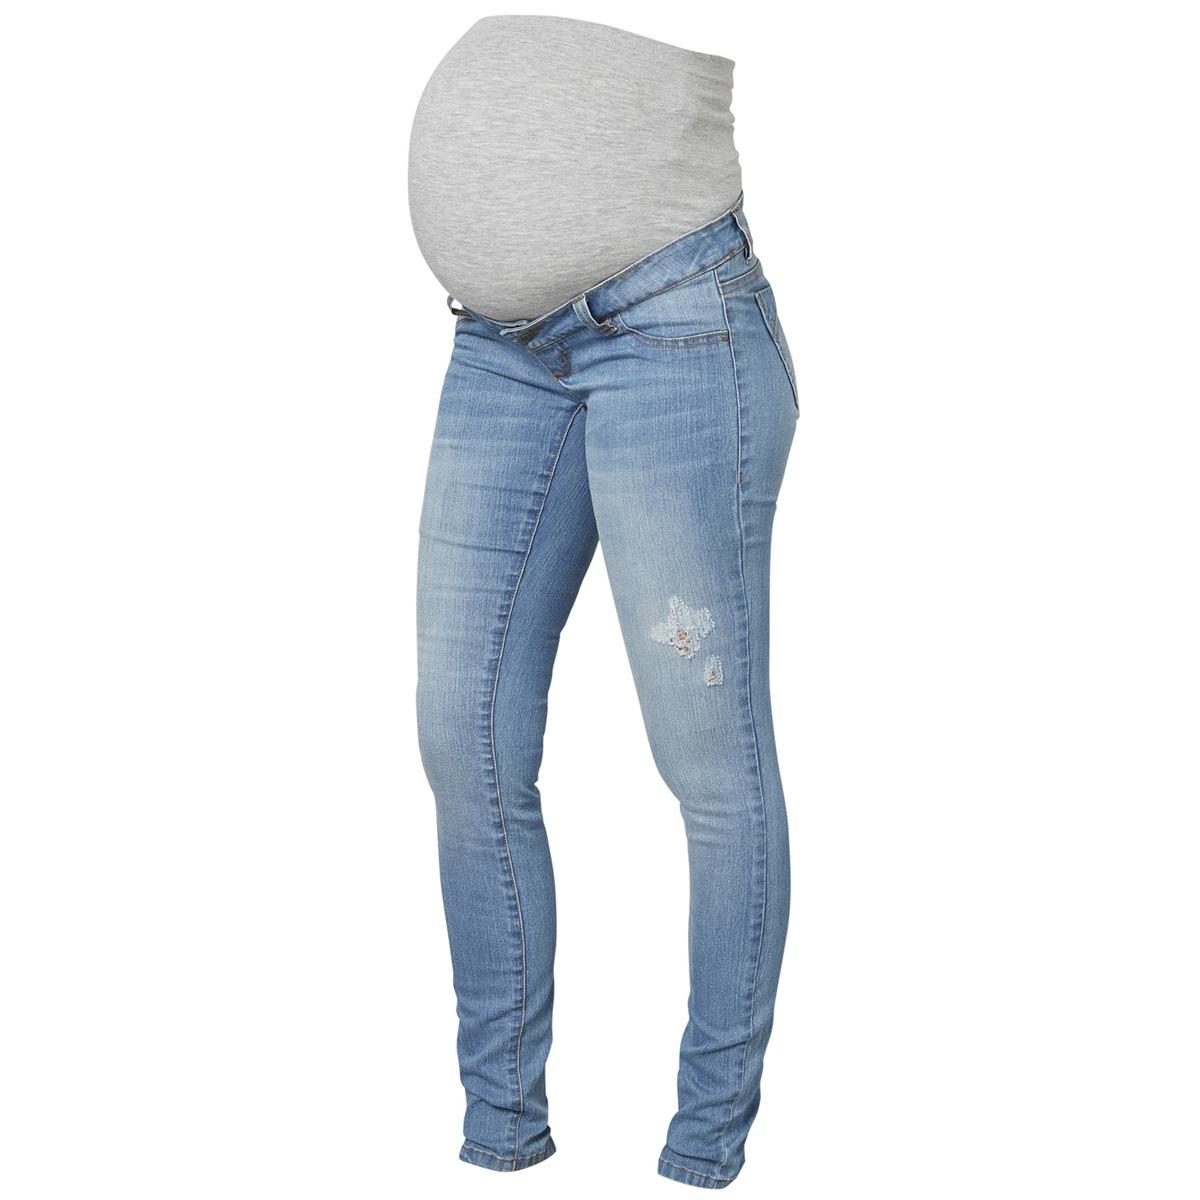 Extreem mljulia slim light blue washed jean 20009641 mama-licious positie #NQ94